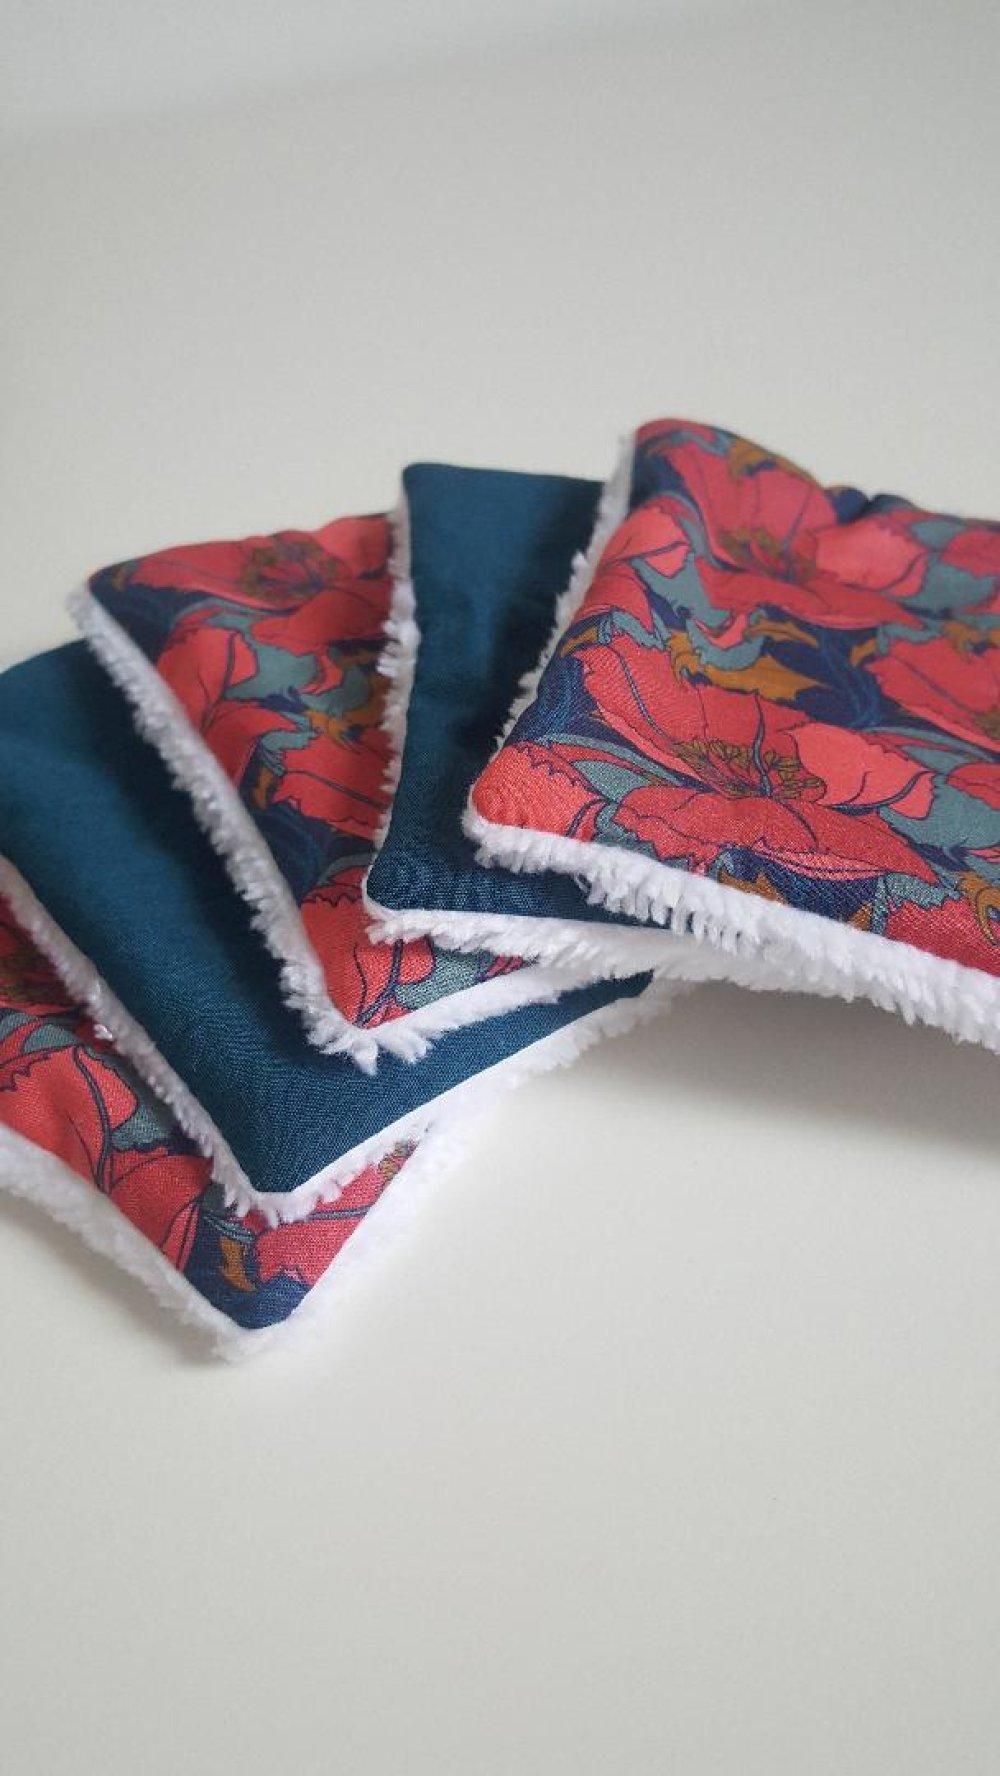 5 lingettes démaquillantes en liberty little eustacia rose et bleu canard